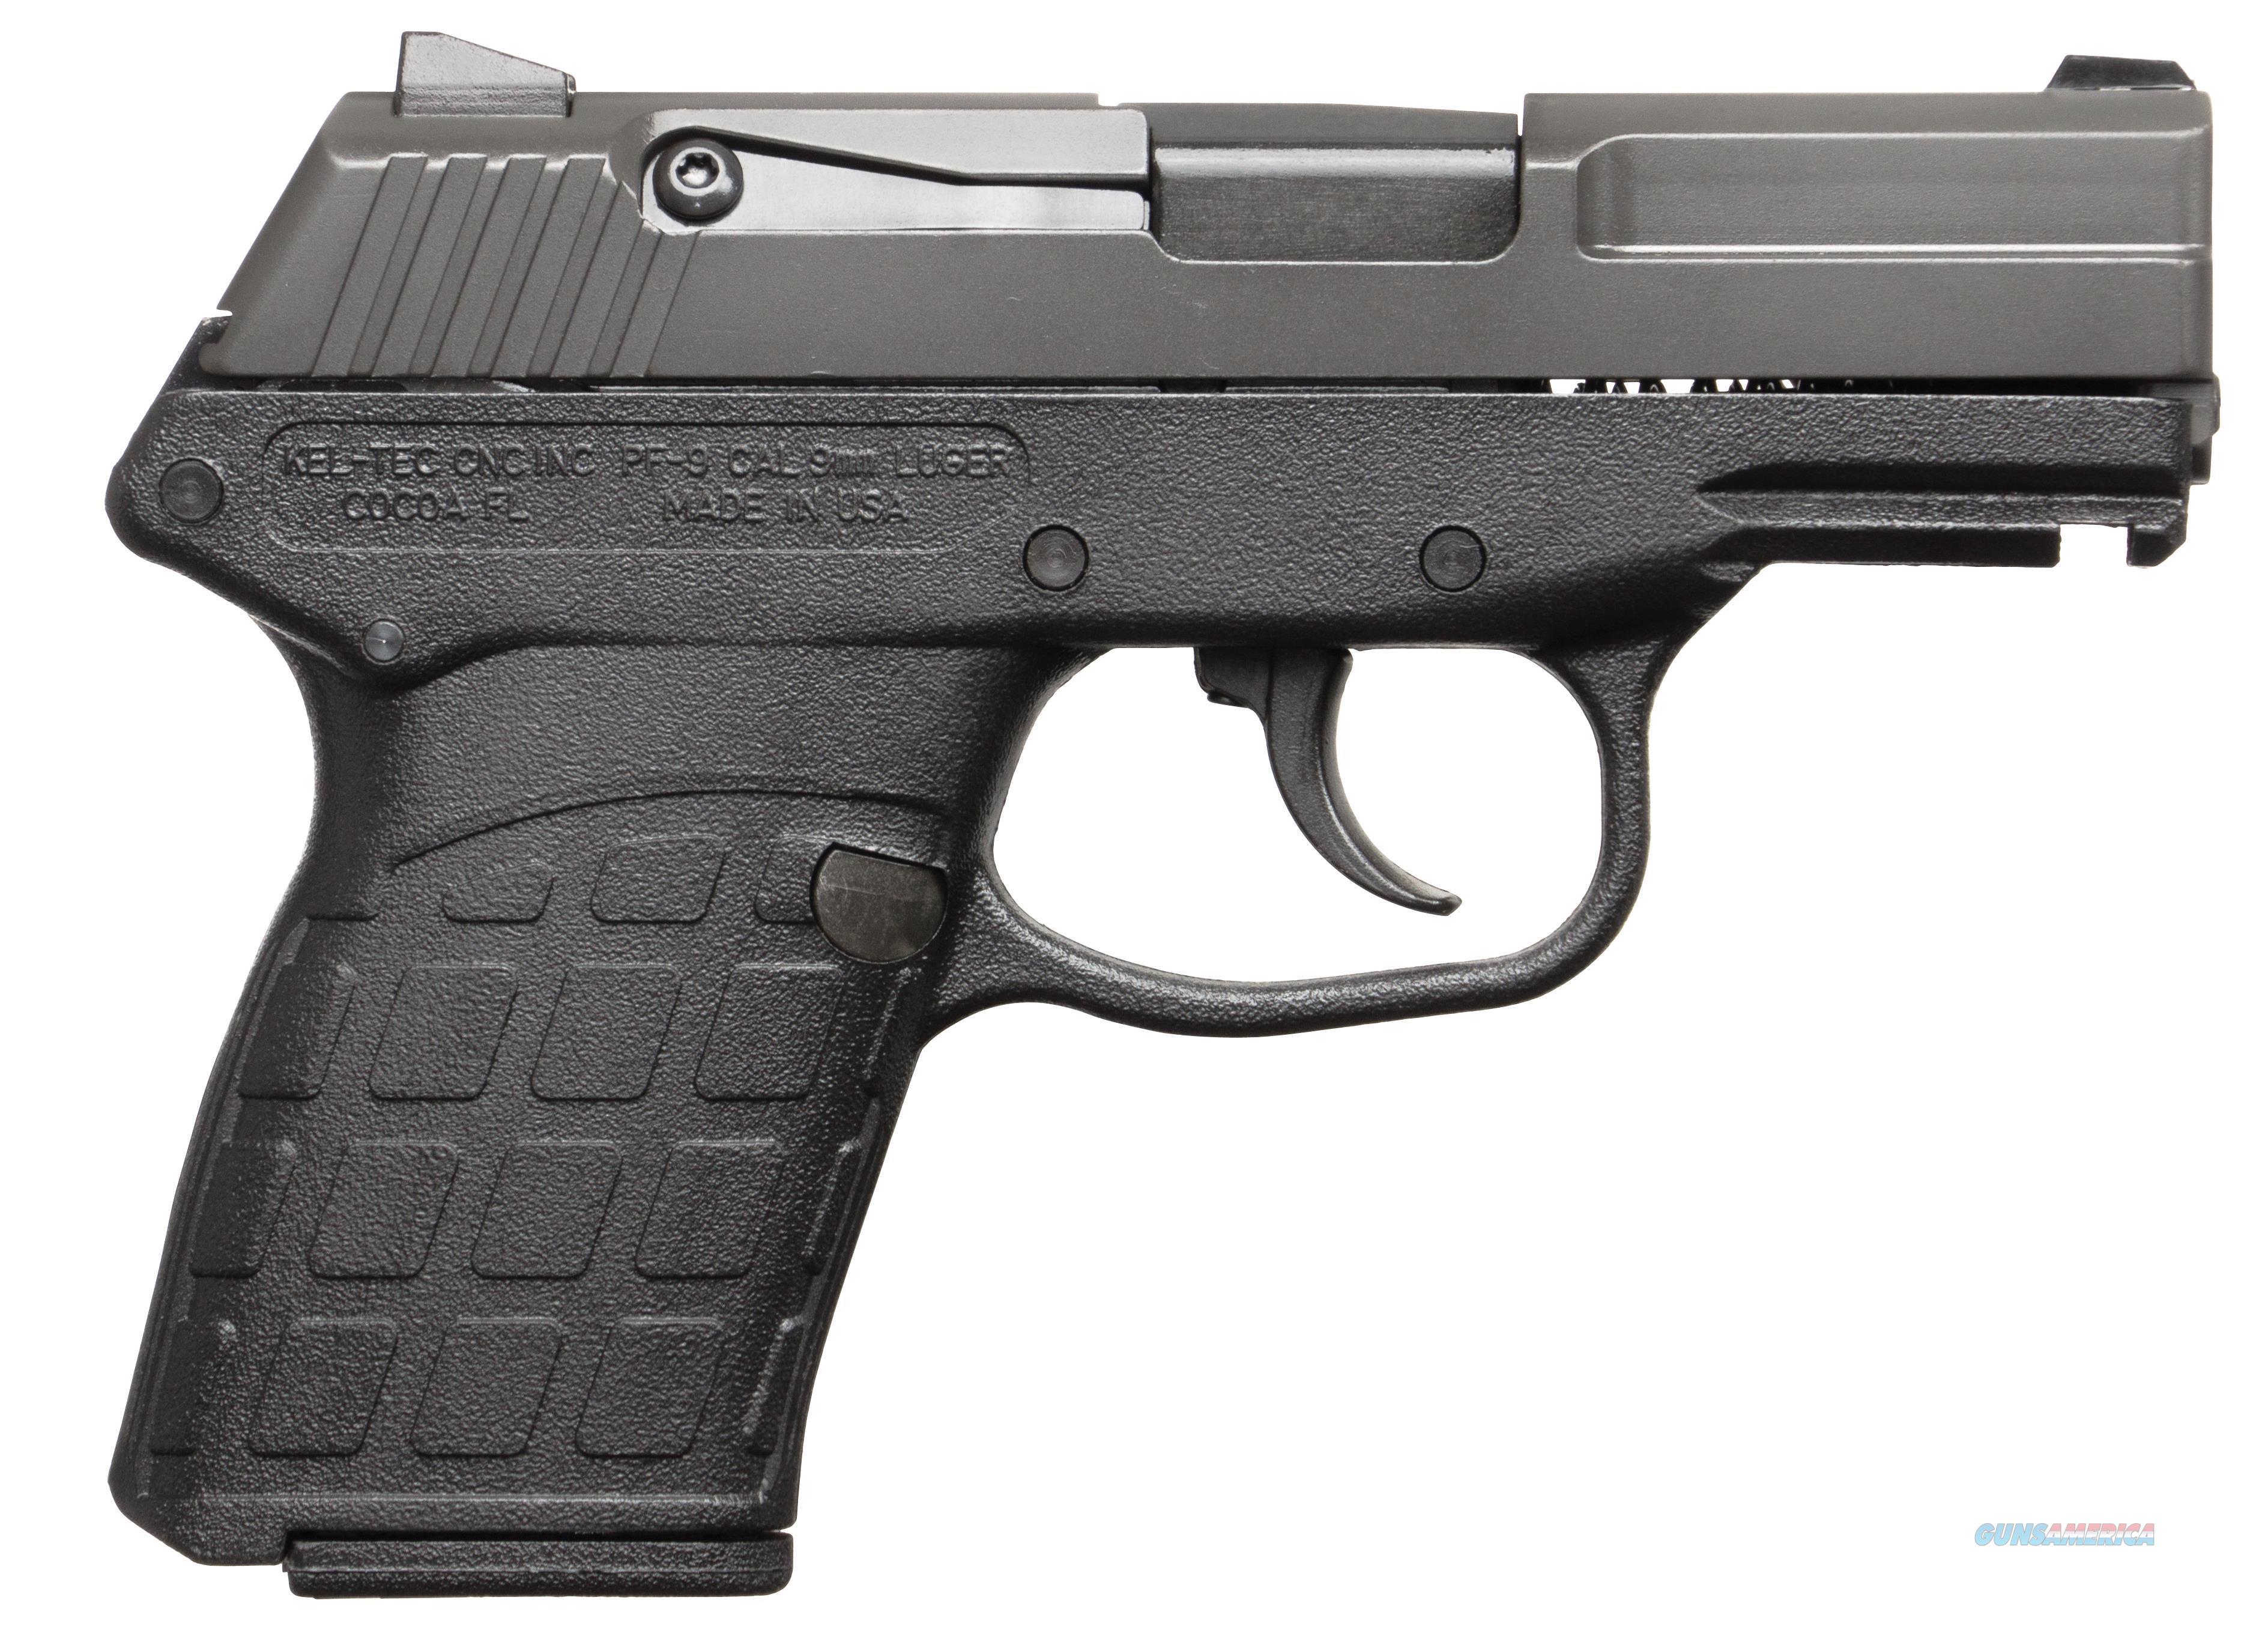 "Kel-Tec Pf9pkblk Pf-9 9Mm 3"" 7+1 Black Poly Grip Parkerized Finish PF9PKBLK  Guns > Pistols > K Misc Pistols"